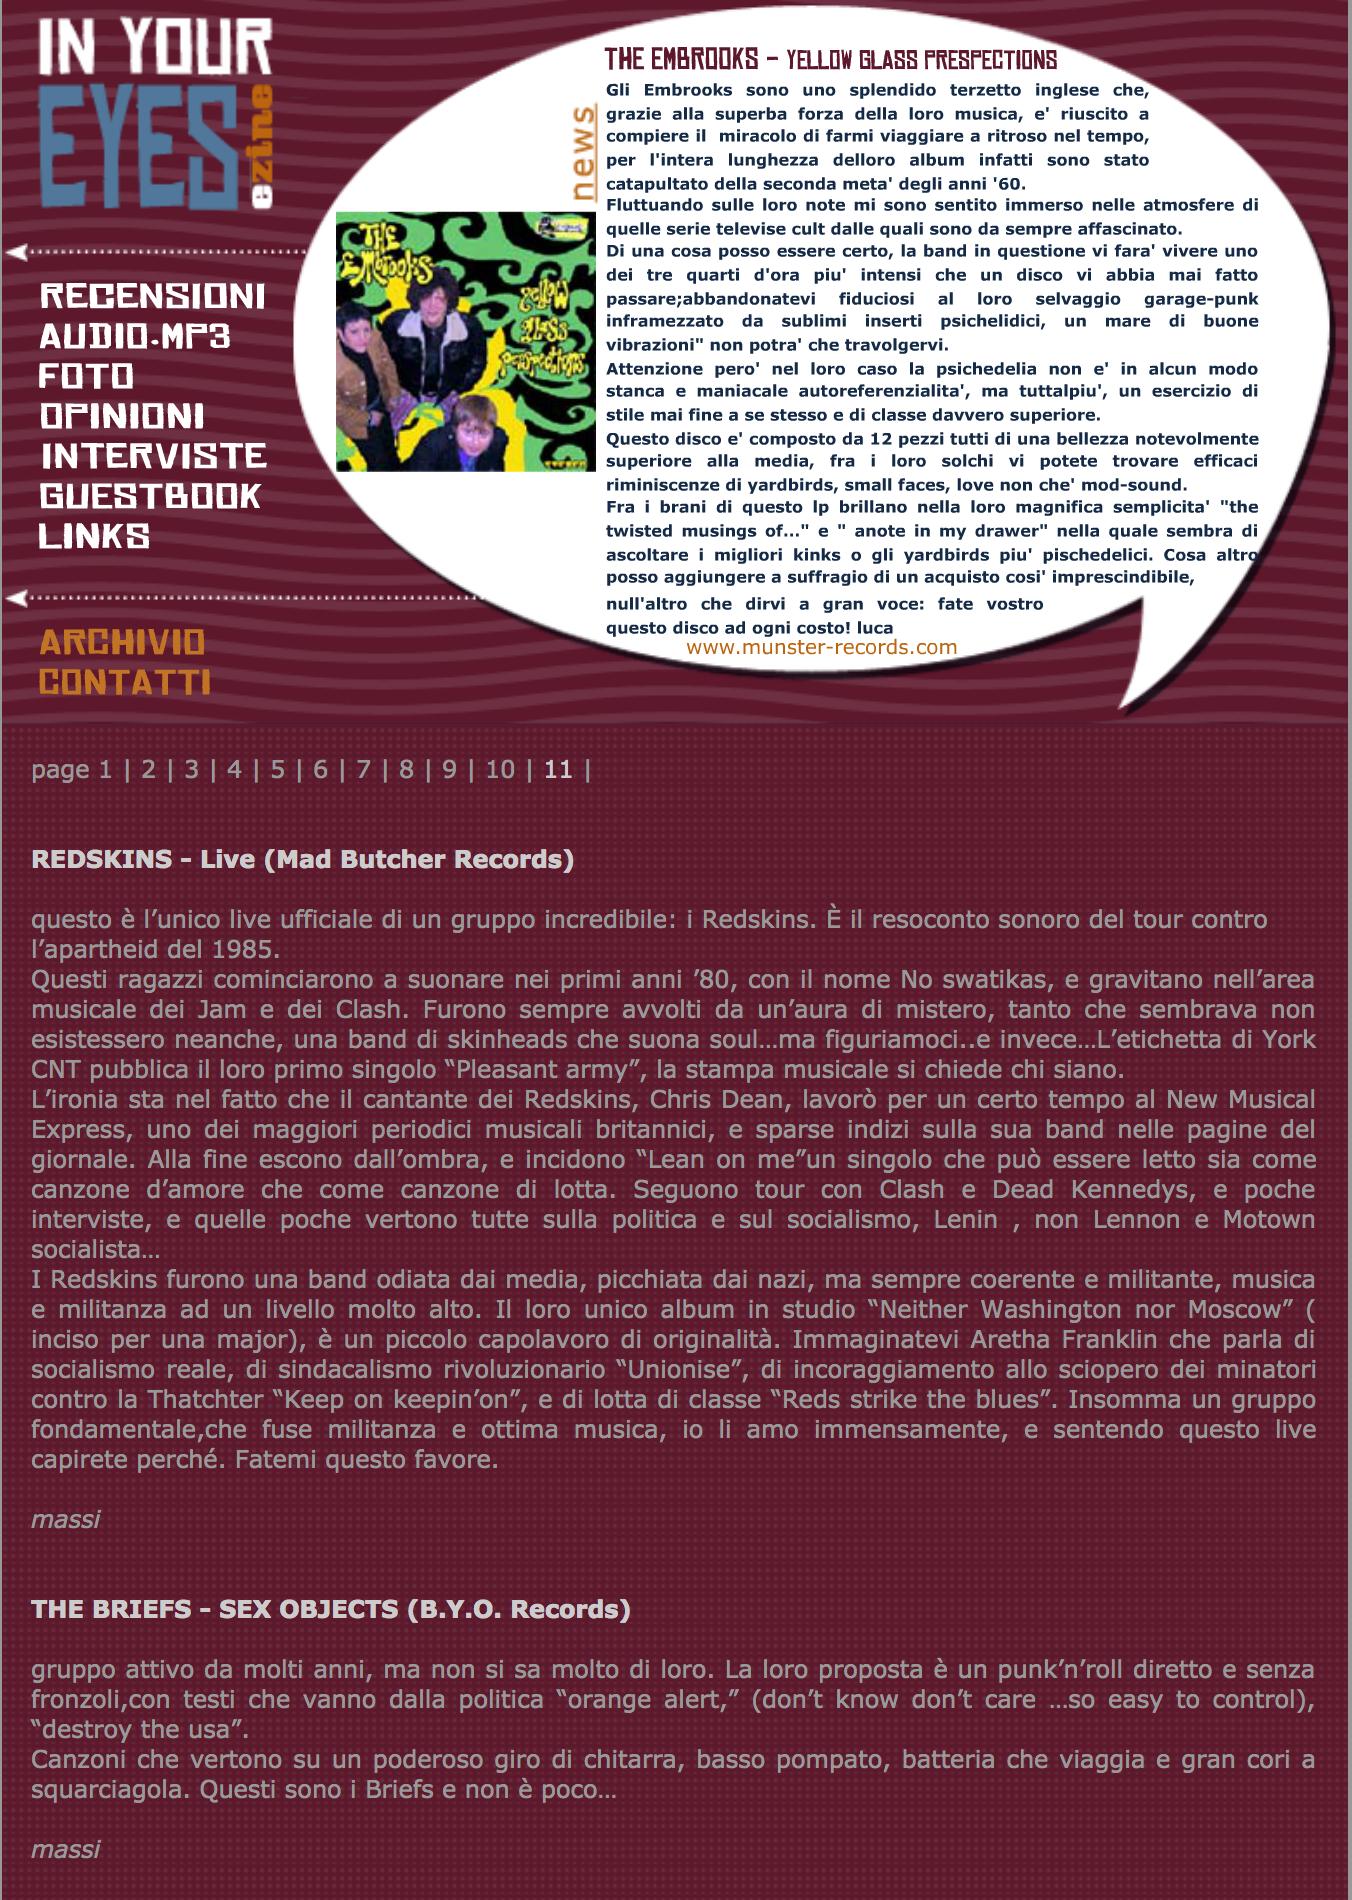 Copertina anno 2005 1 - fanzine